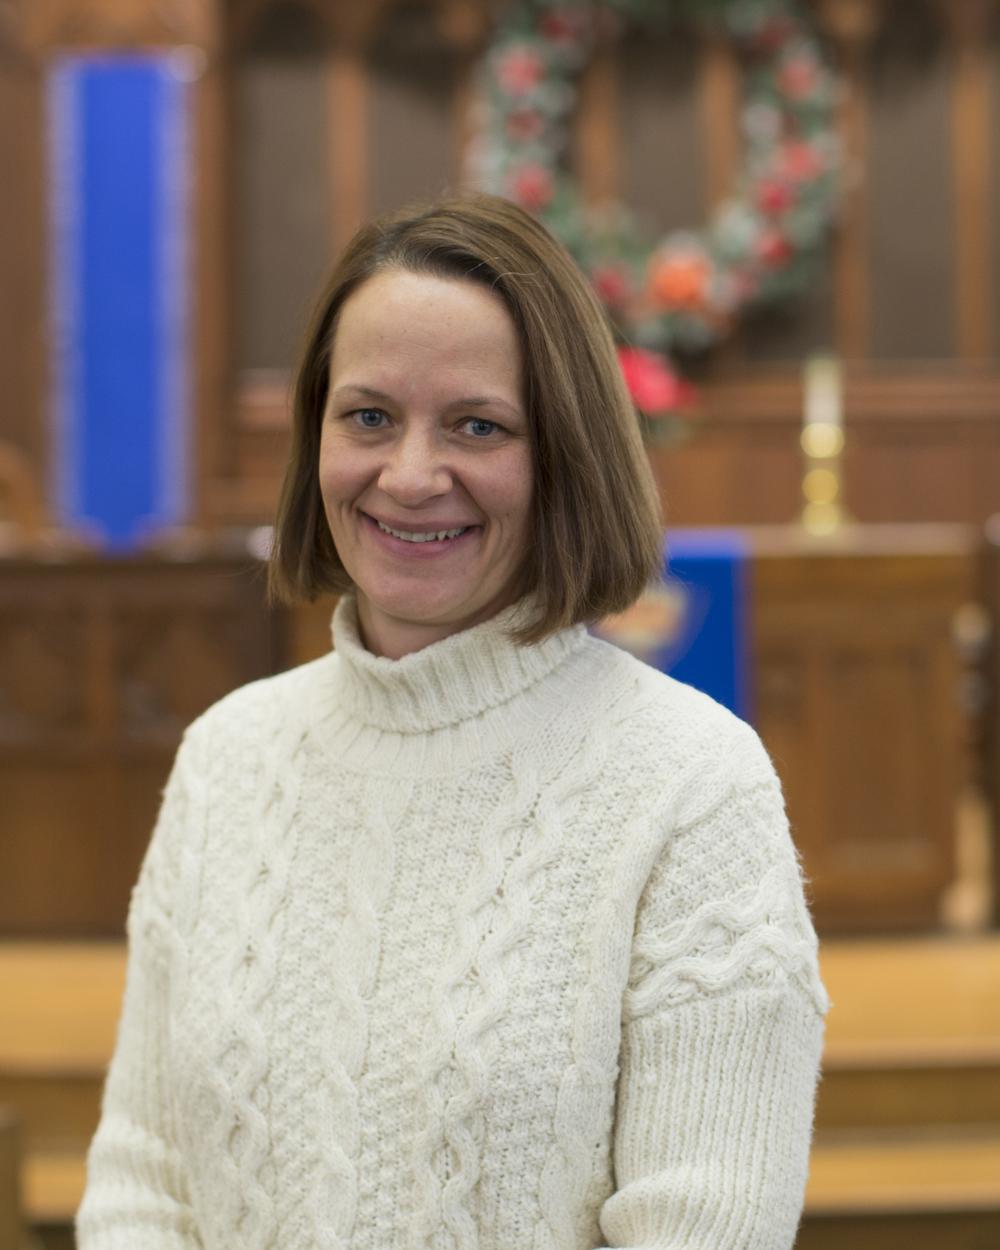 Rev. Greta Hietpas - Minister of Discipleship